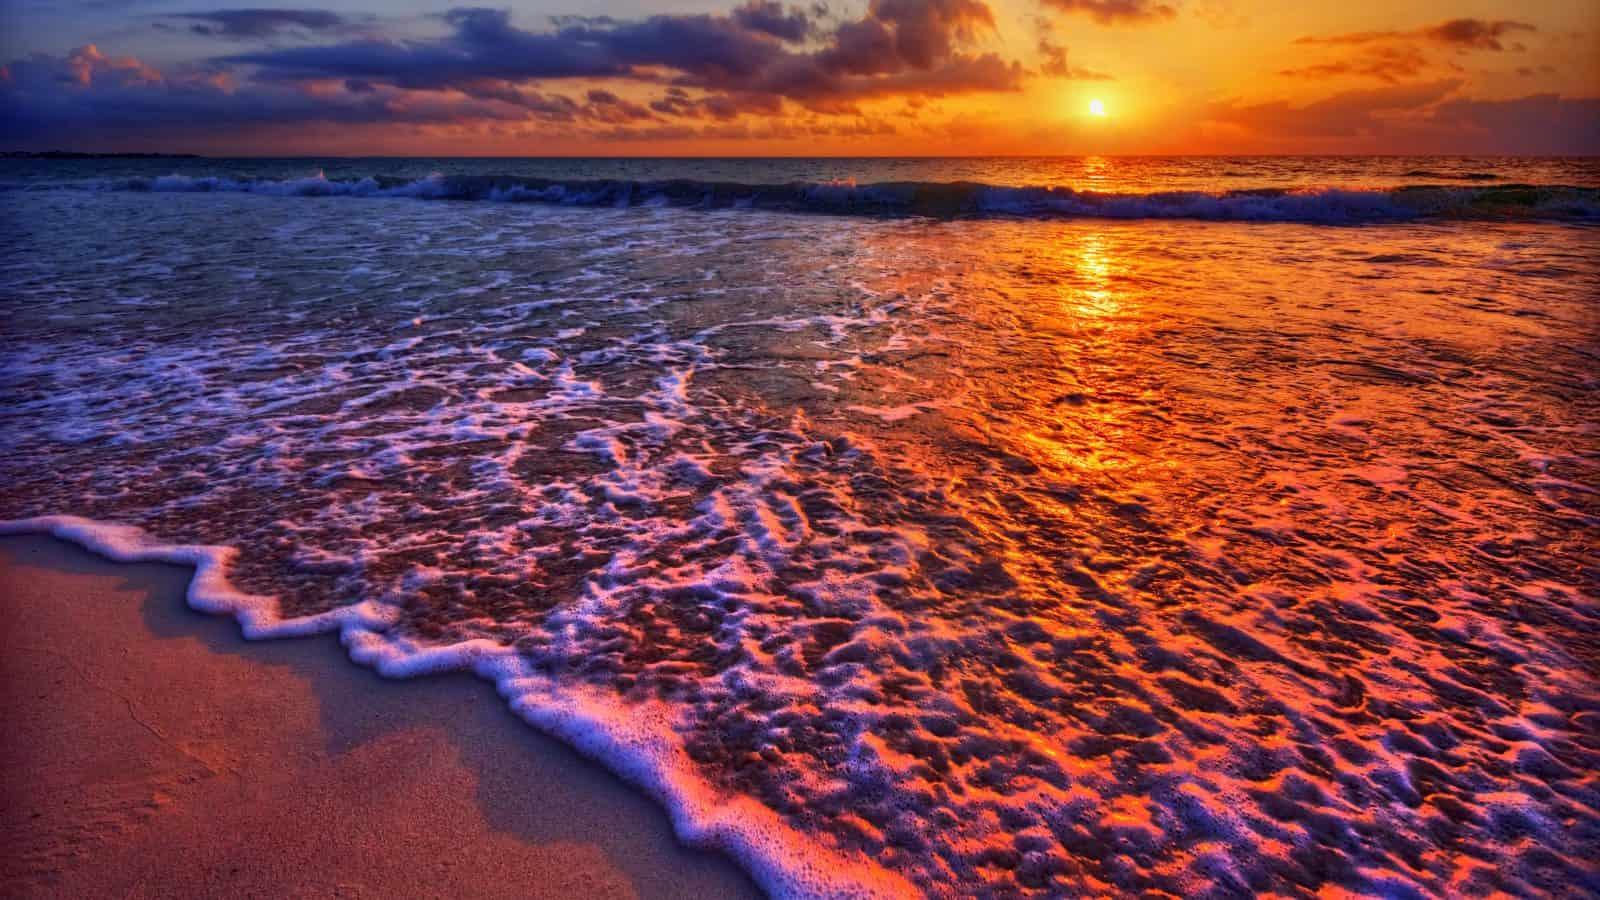 The sun sets on the shoreline of Sanibel Island.